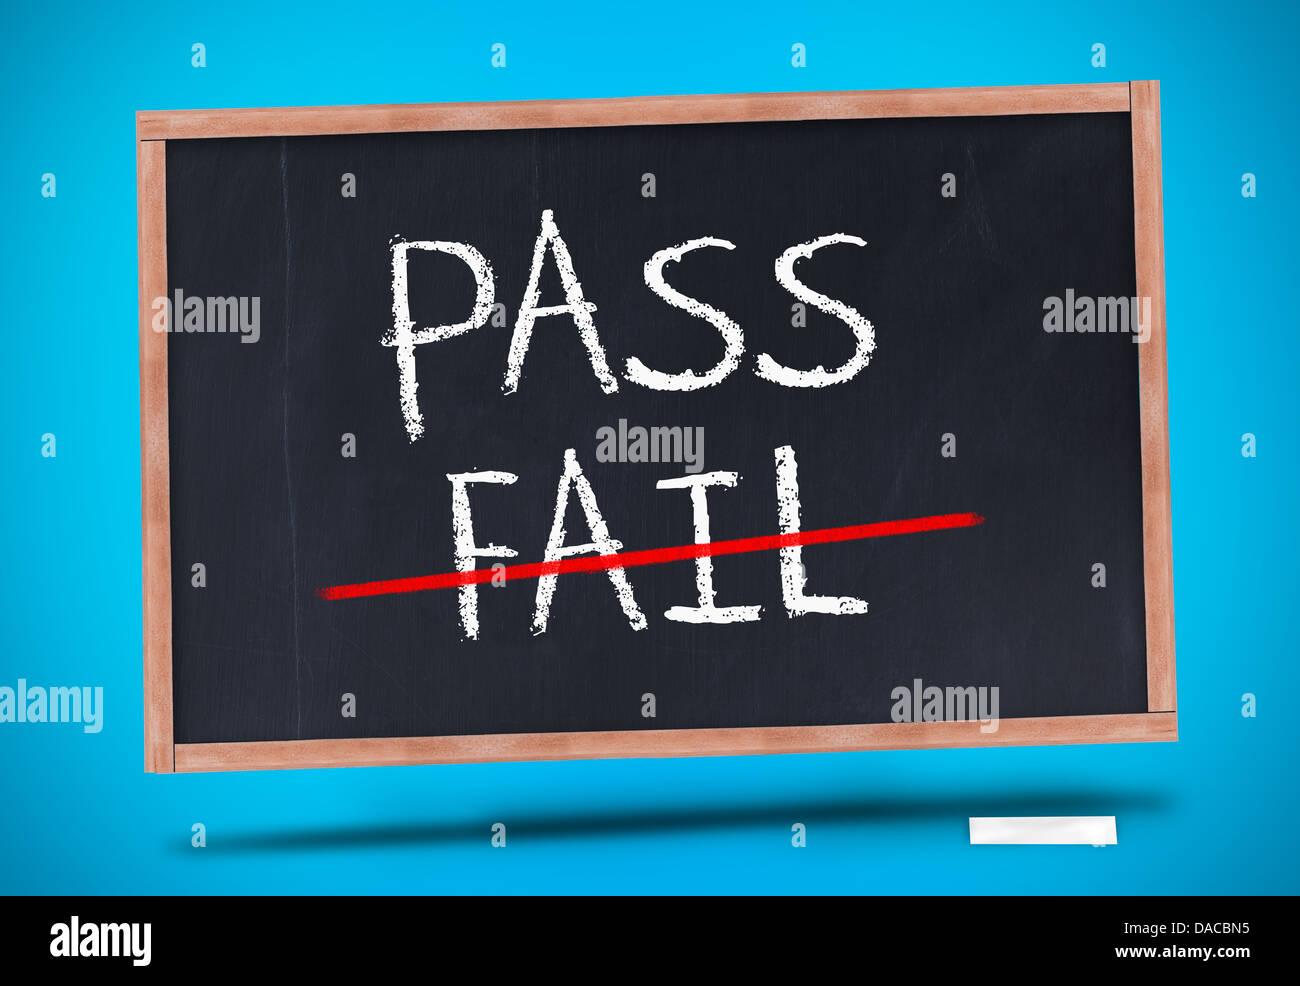 Pass and fail written on blackboard - Stock Image